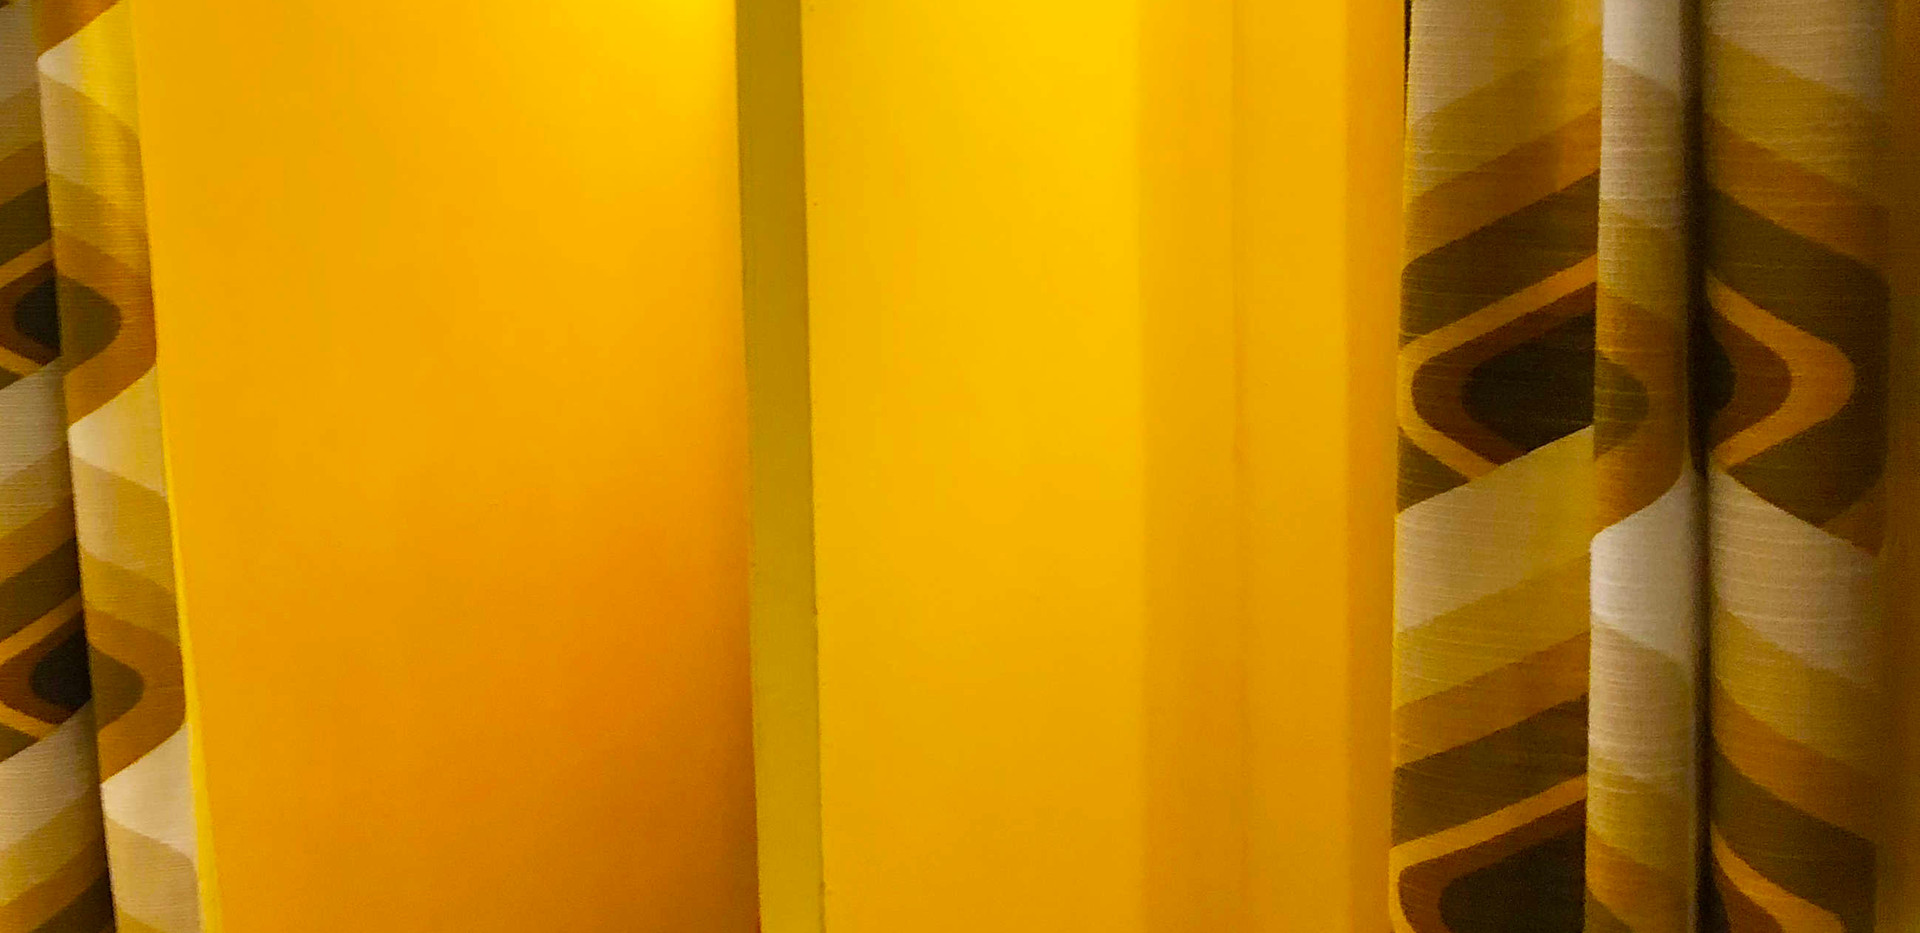 The Yellow Shop 3439.jpg